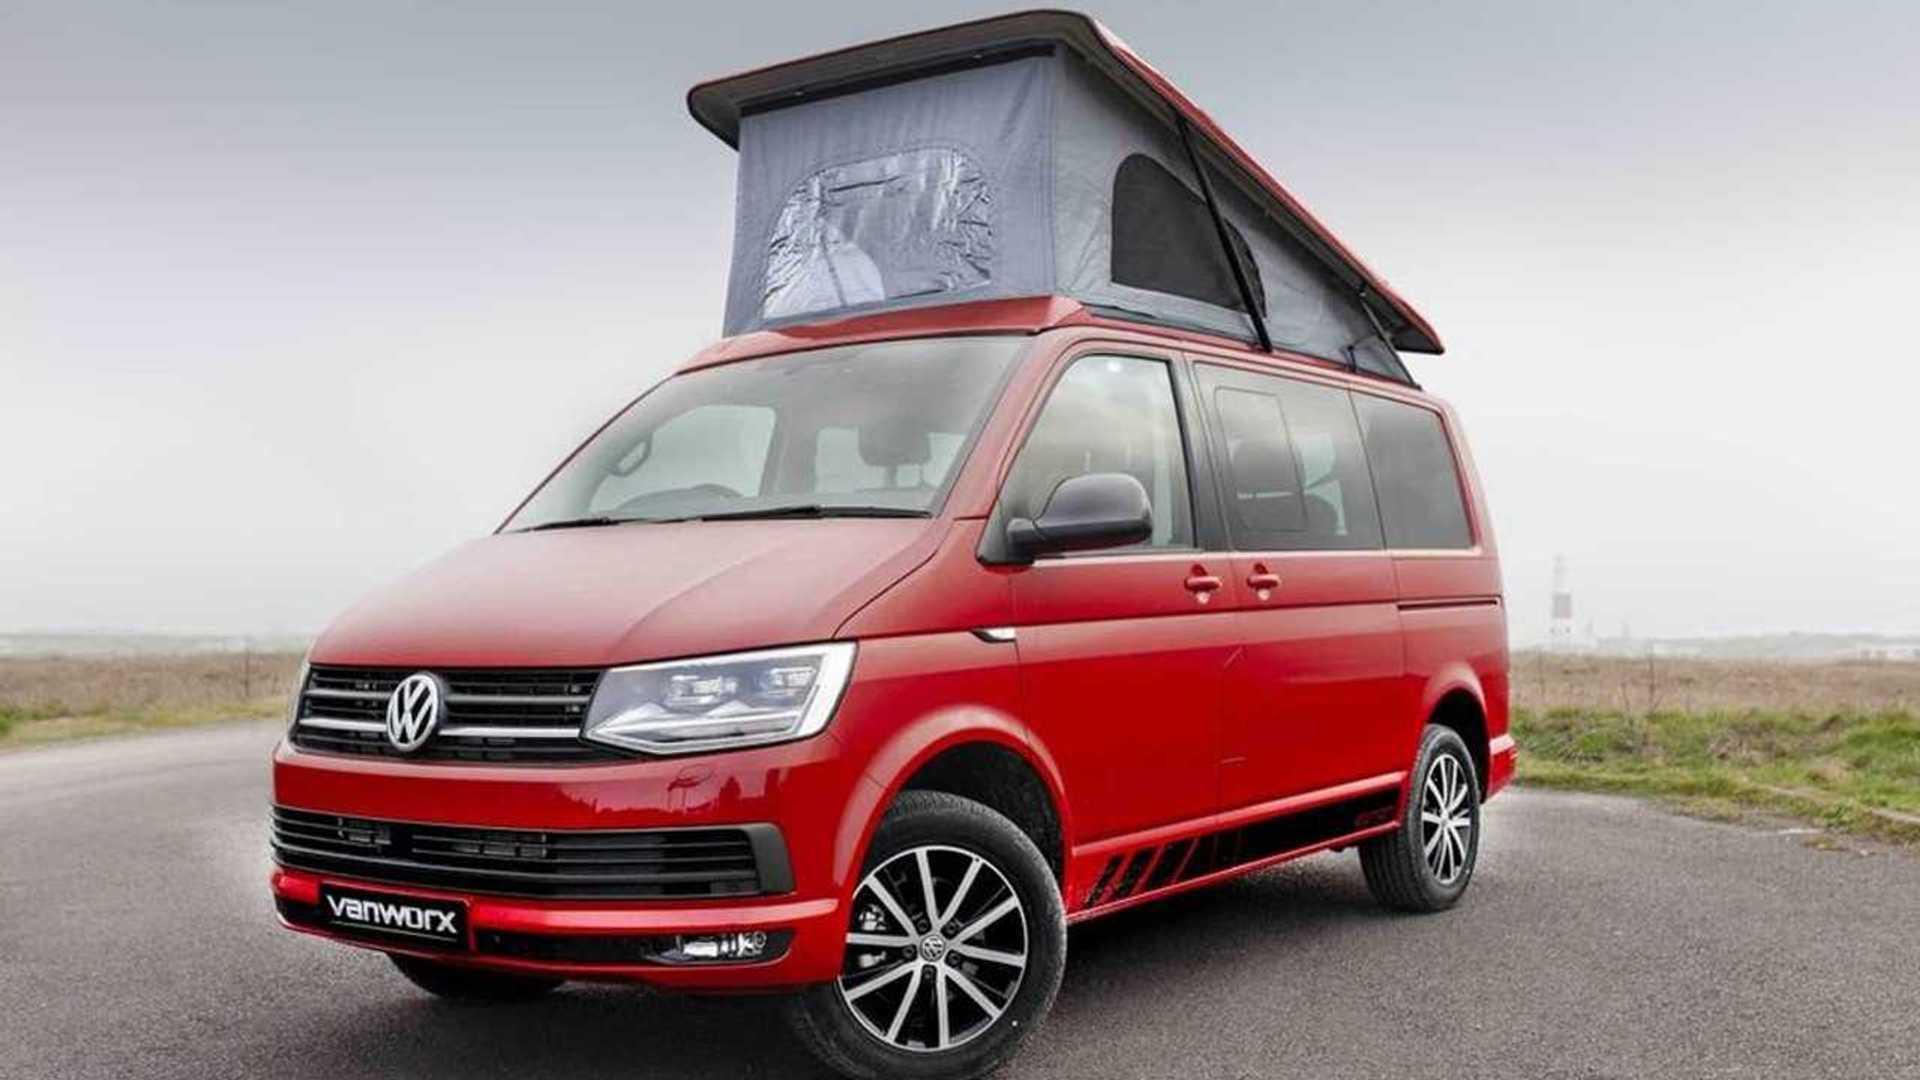 Vw Camper Van >> 10 Best Volkswagen Camper Vans For The Ultimate Road Trip